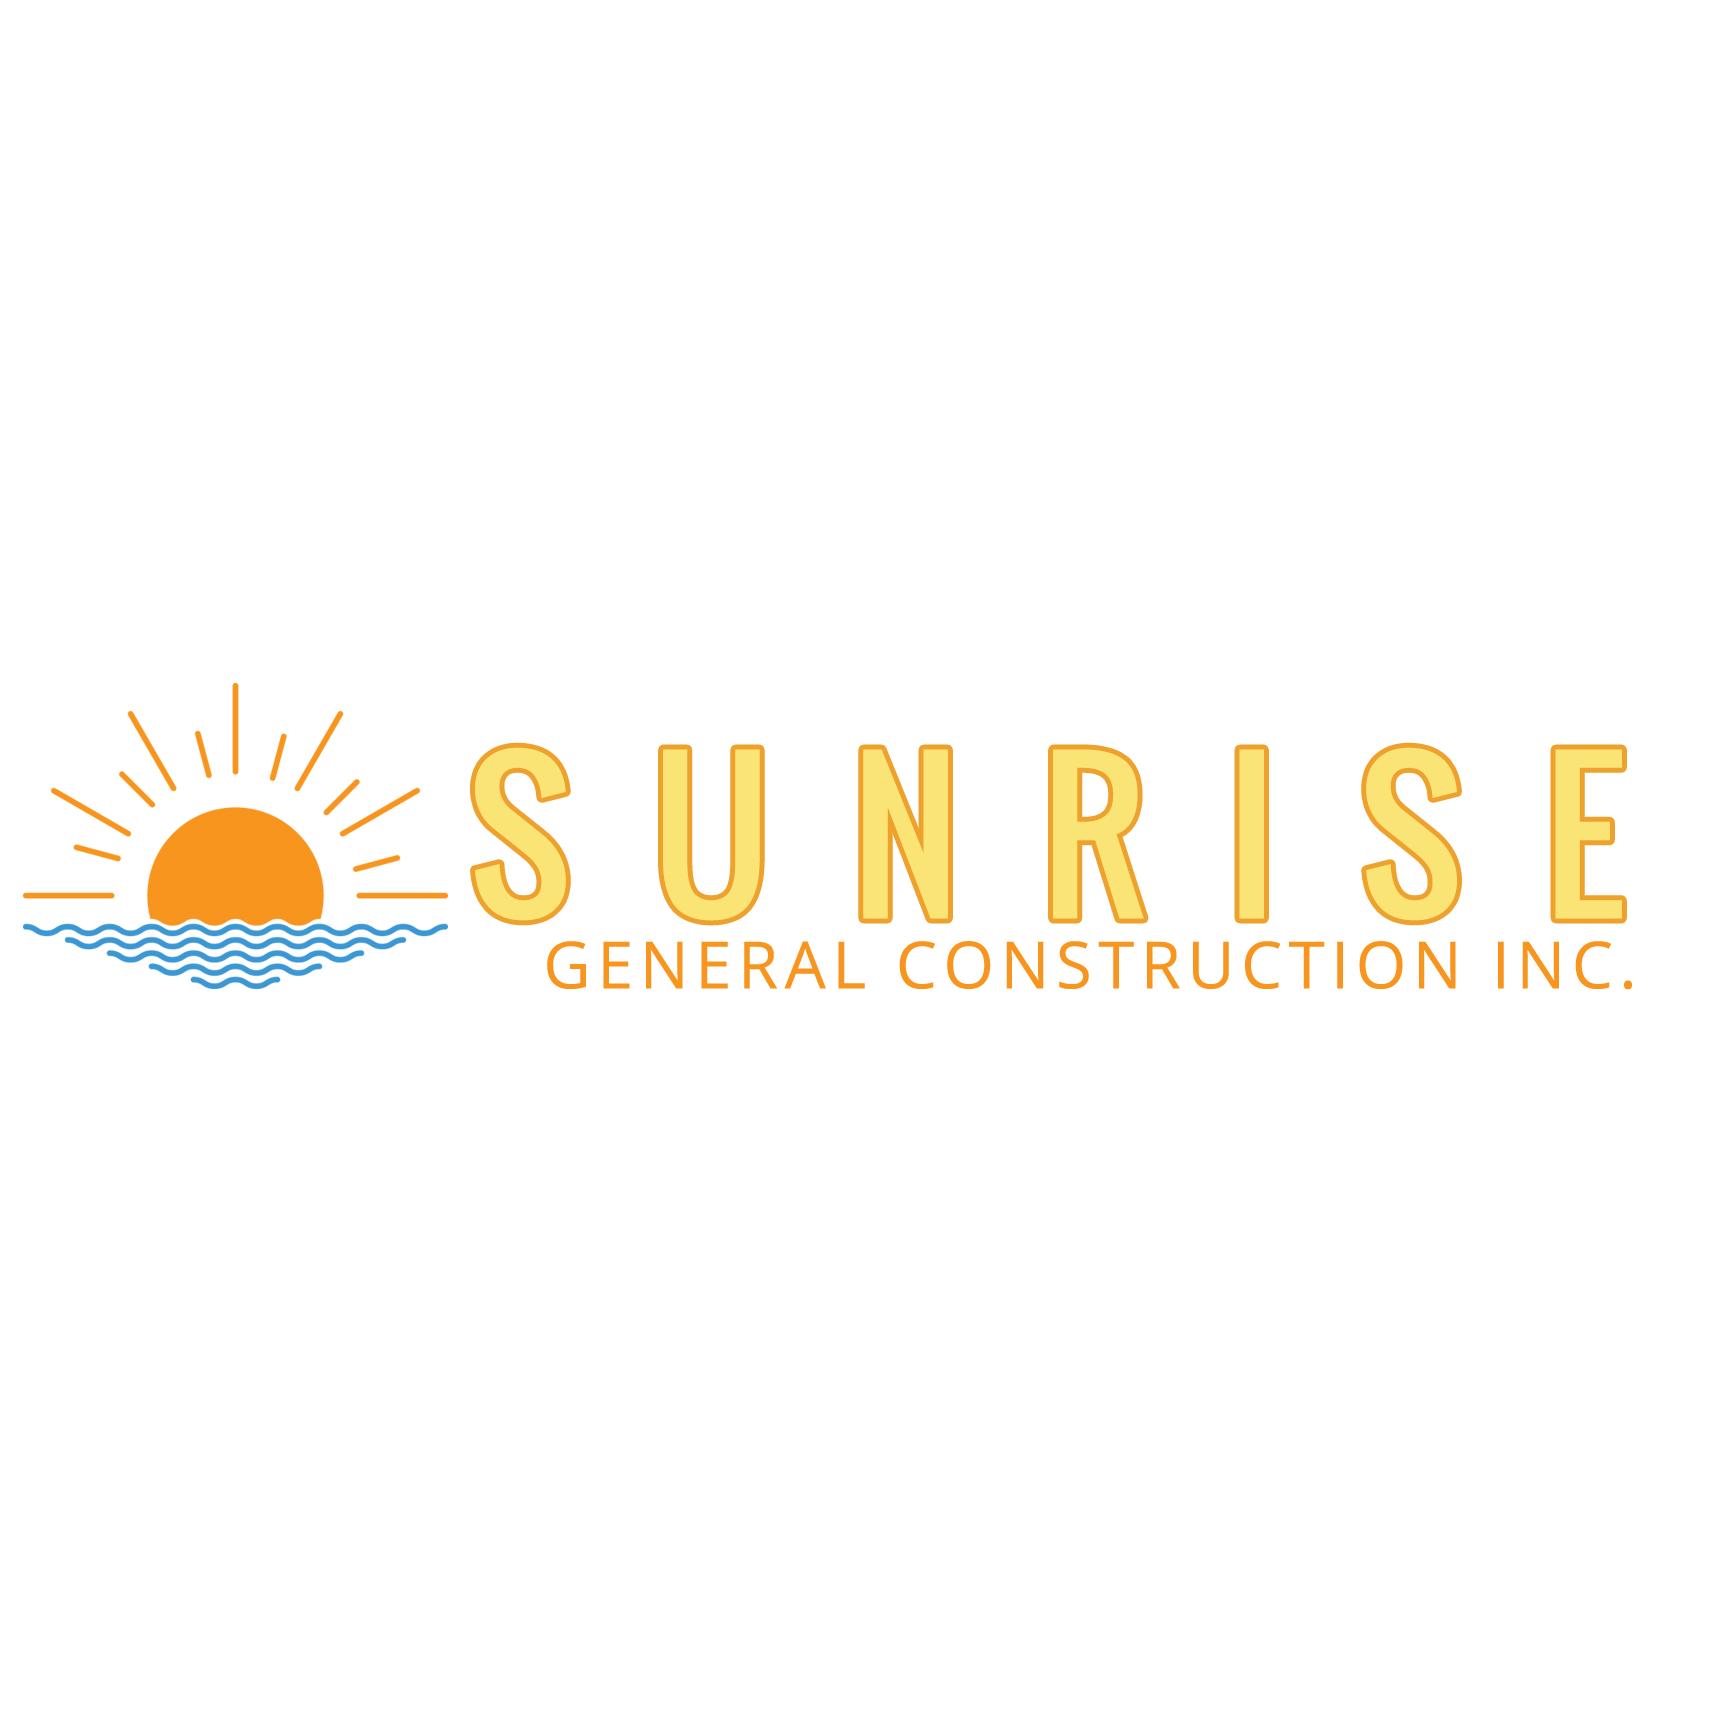 Sunrise General Construction